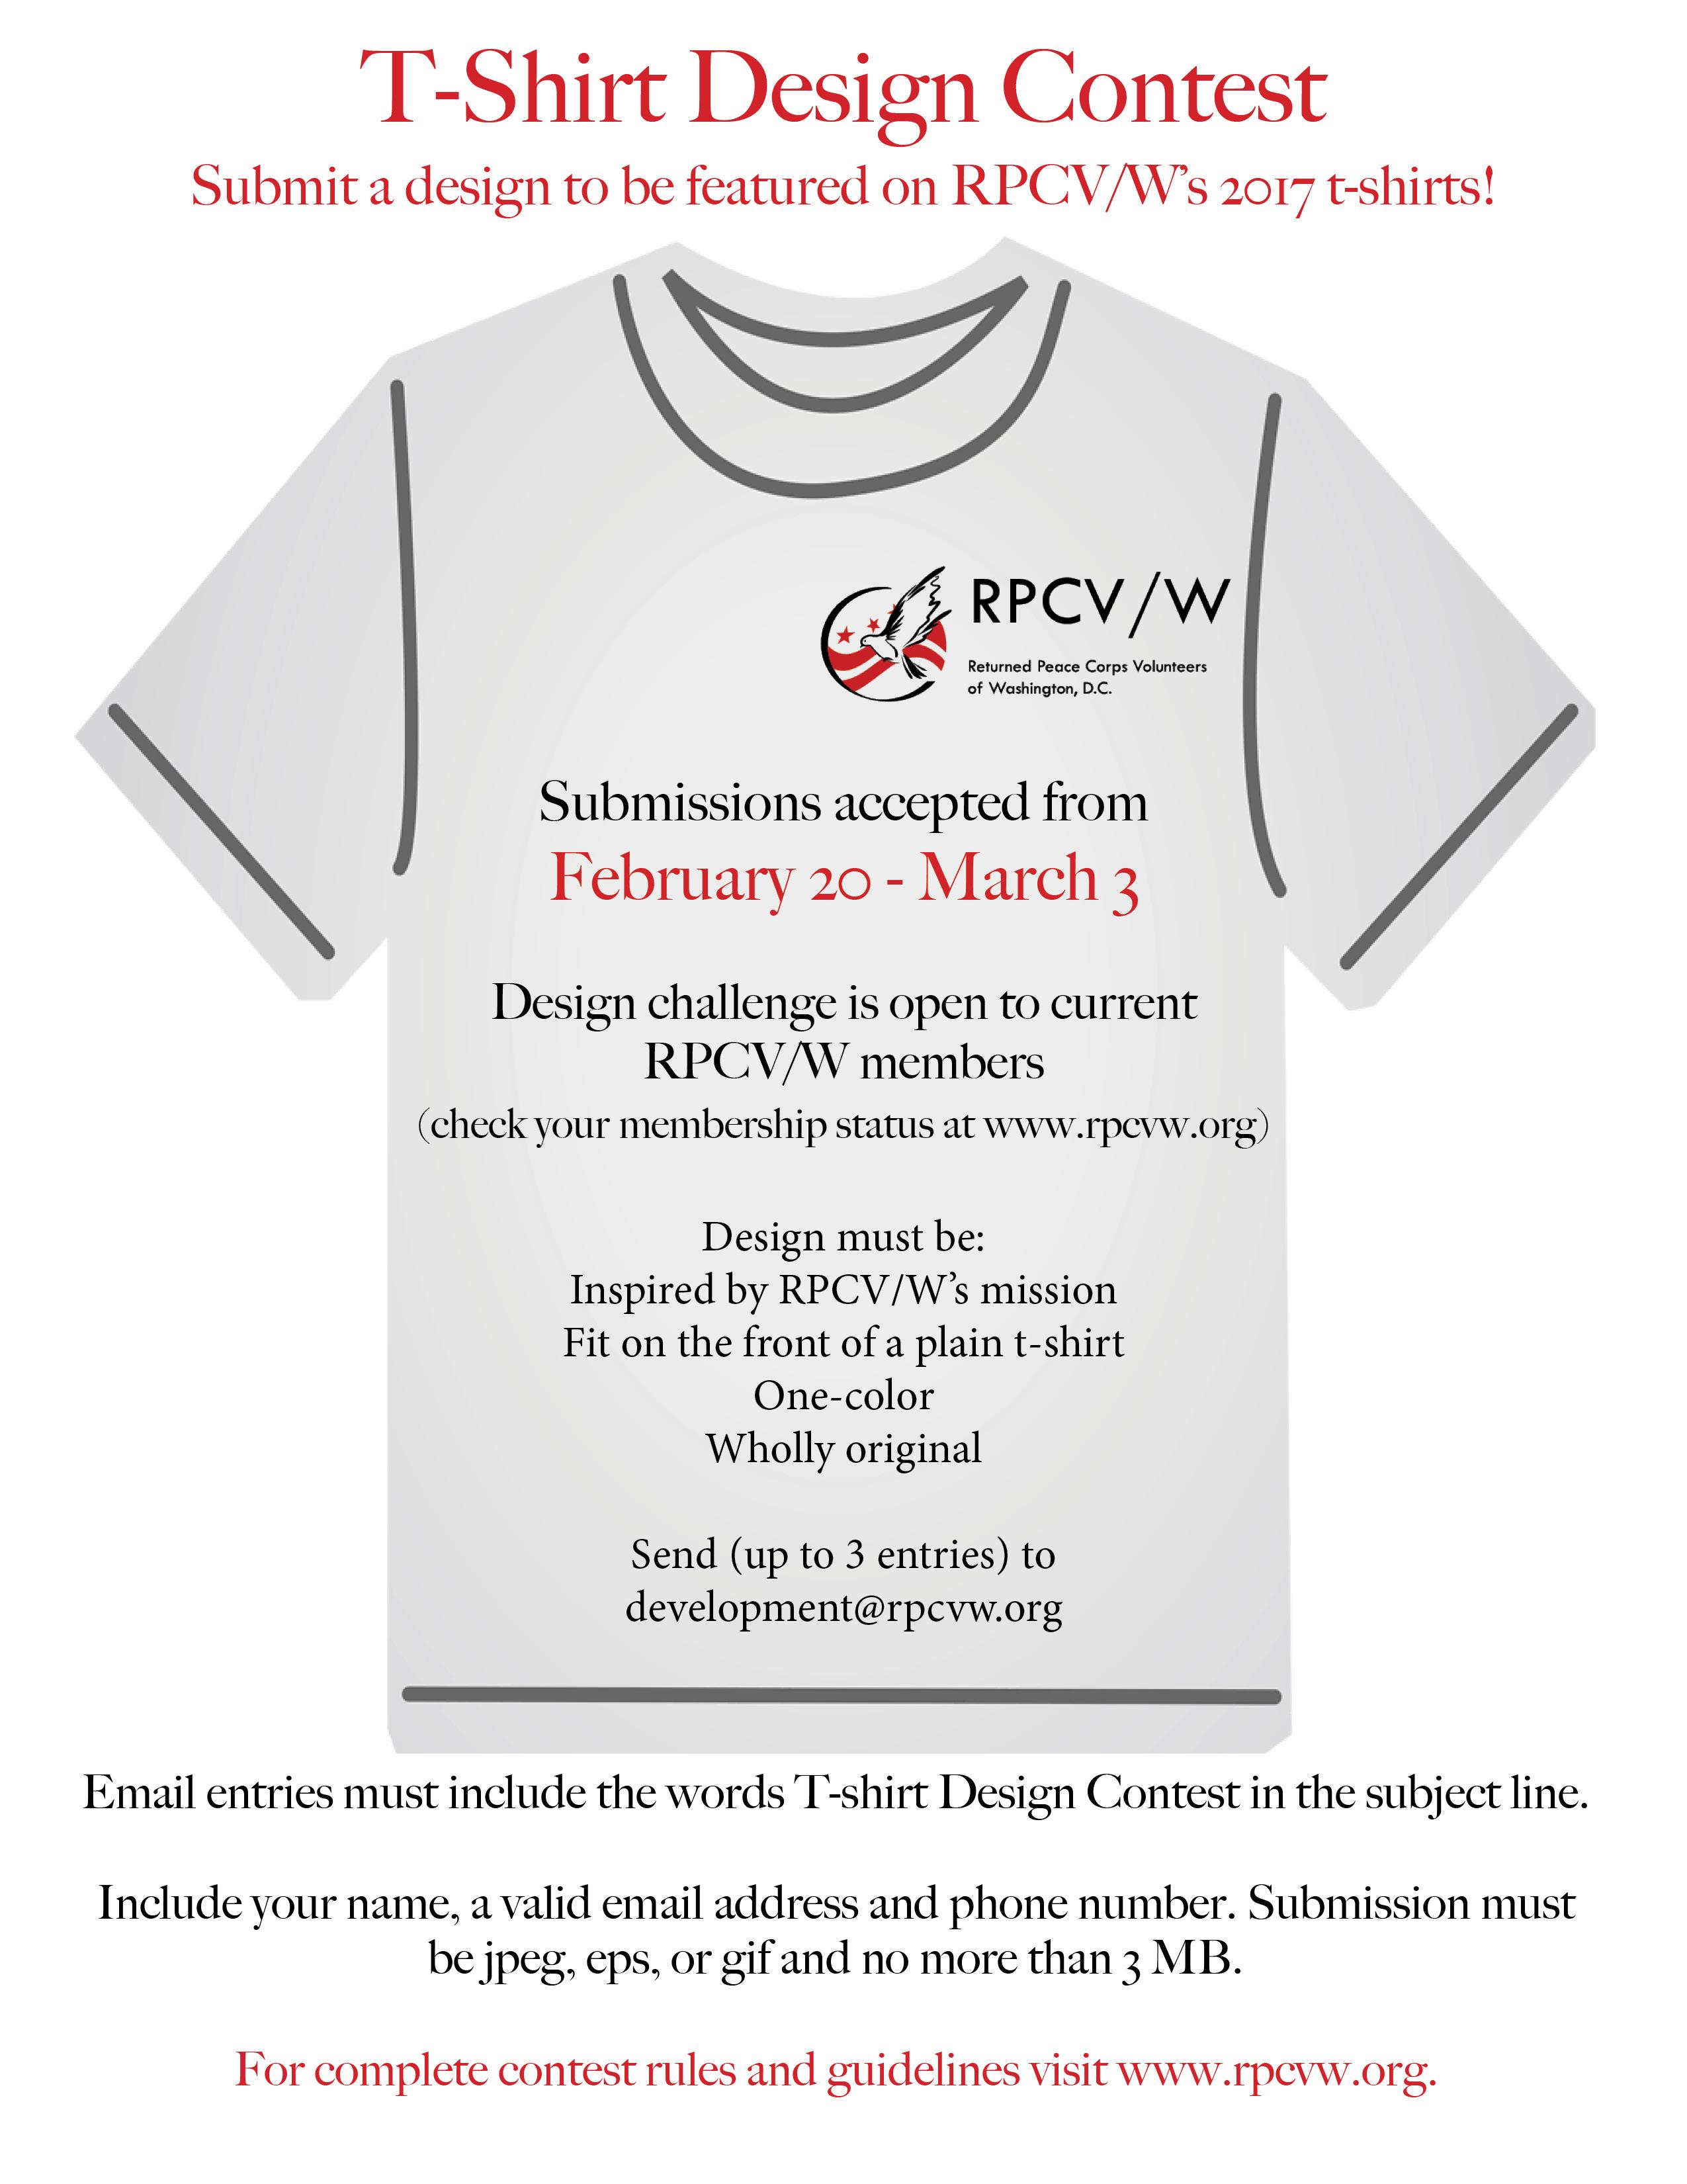 Shirt design rules - Shirt Design Rules 56